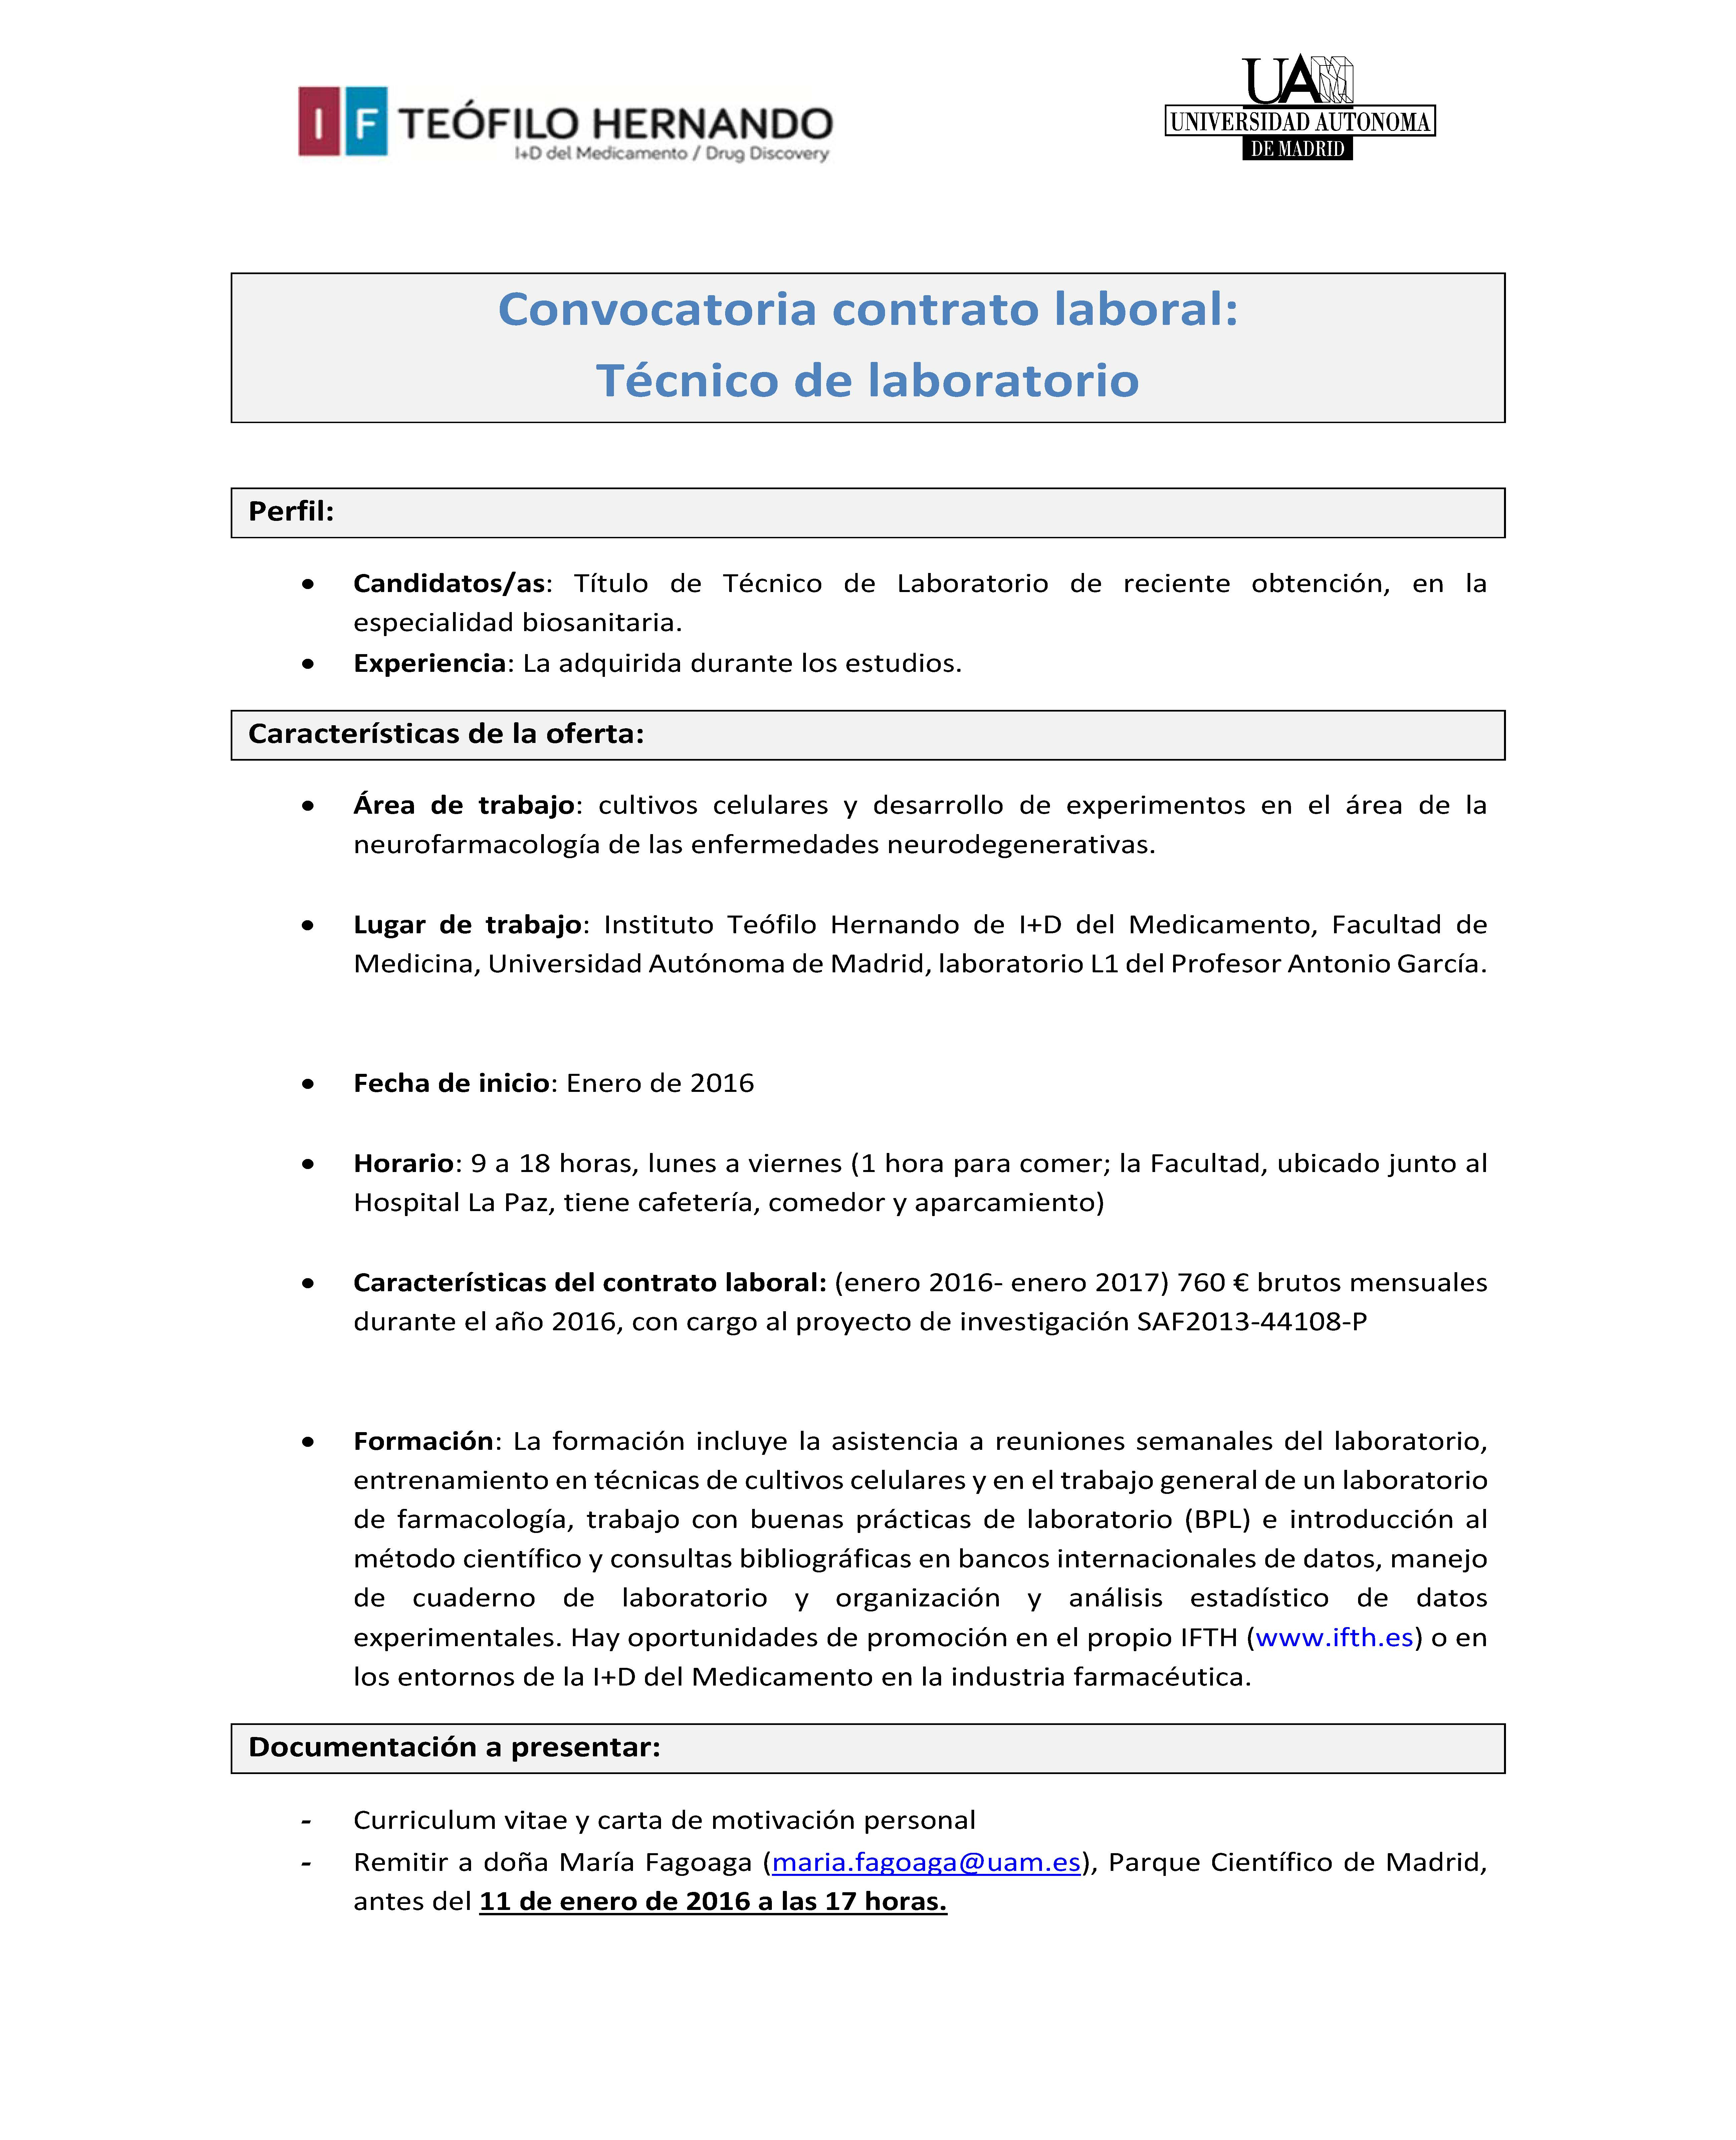 Bewerbung solicitud application - 2 part 10